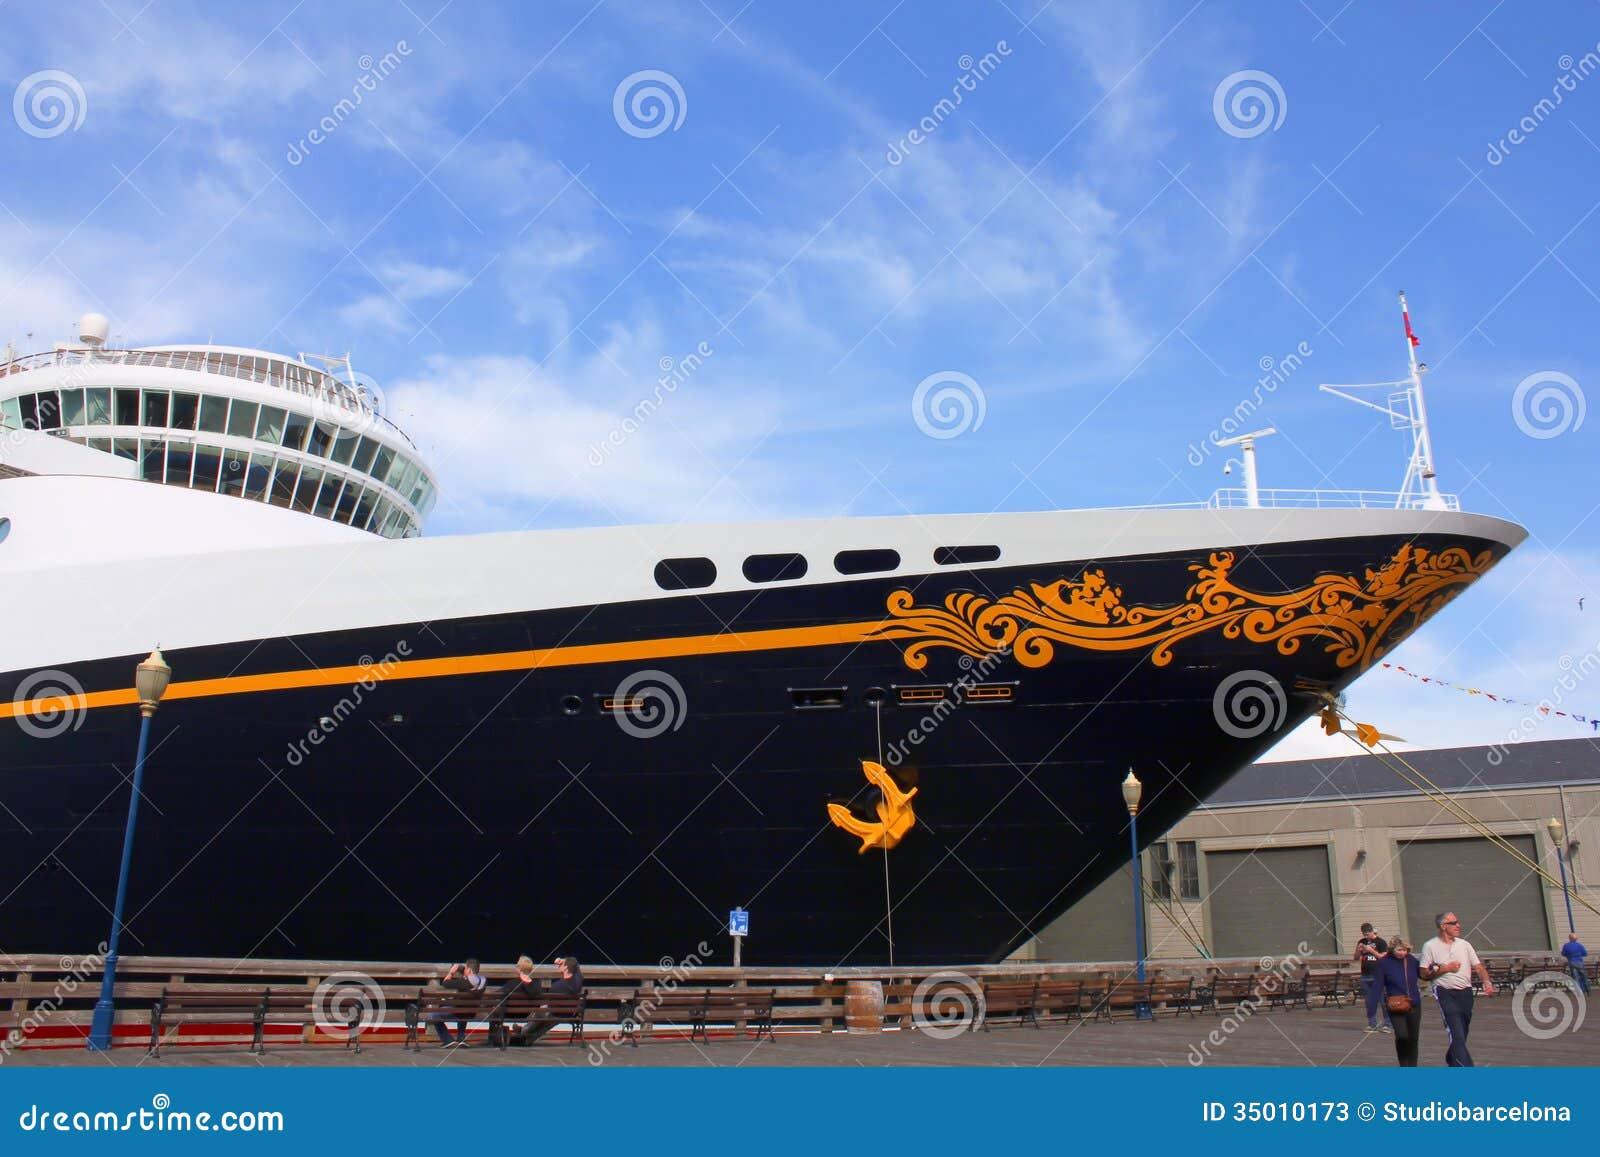 Disney Wonder Cruise Ship Clip Art Disney wonder ship editorial